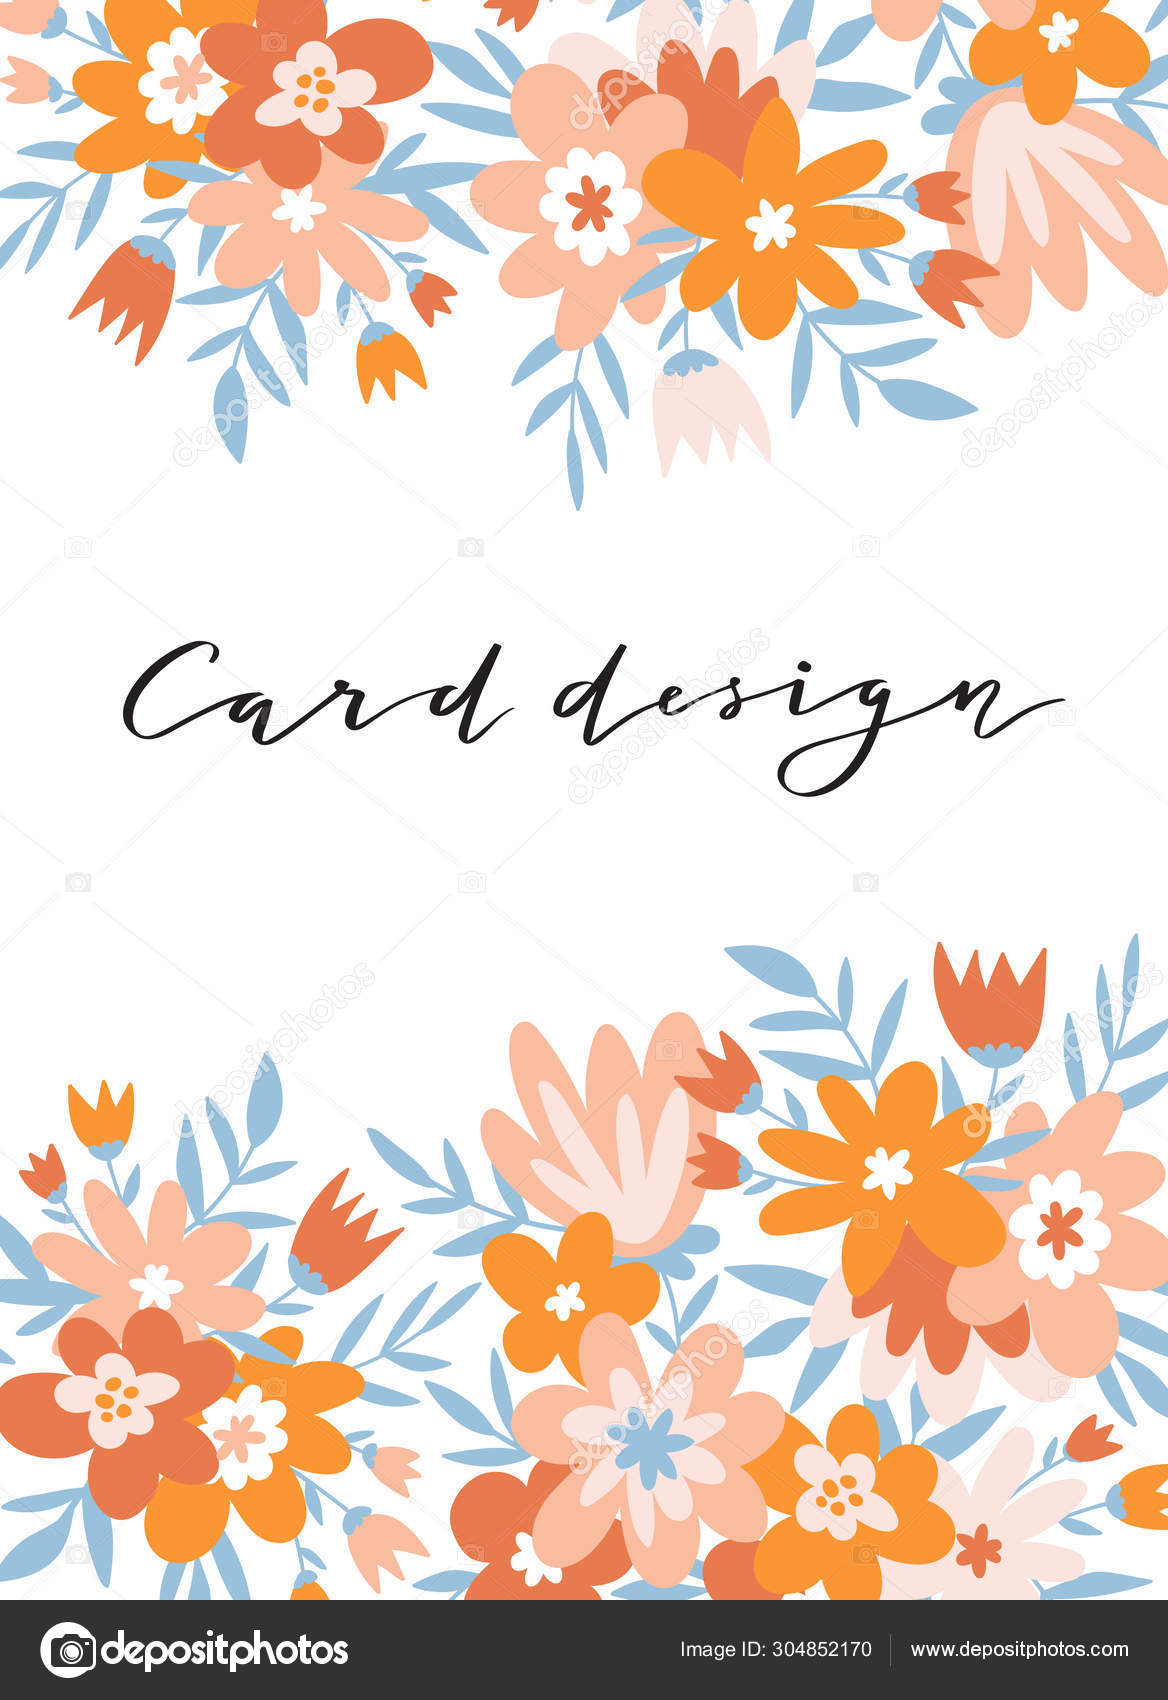 Romantic Flower Card Cute Wedding Invitation Template Design Vector Illustration Stock Vector C Utro Na More 304852170